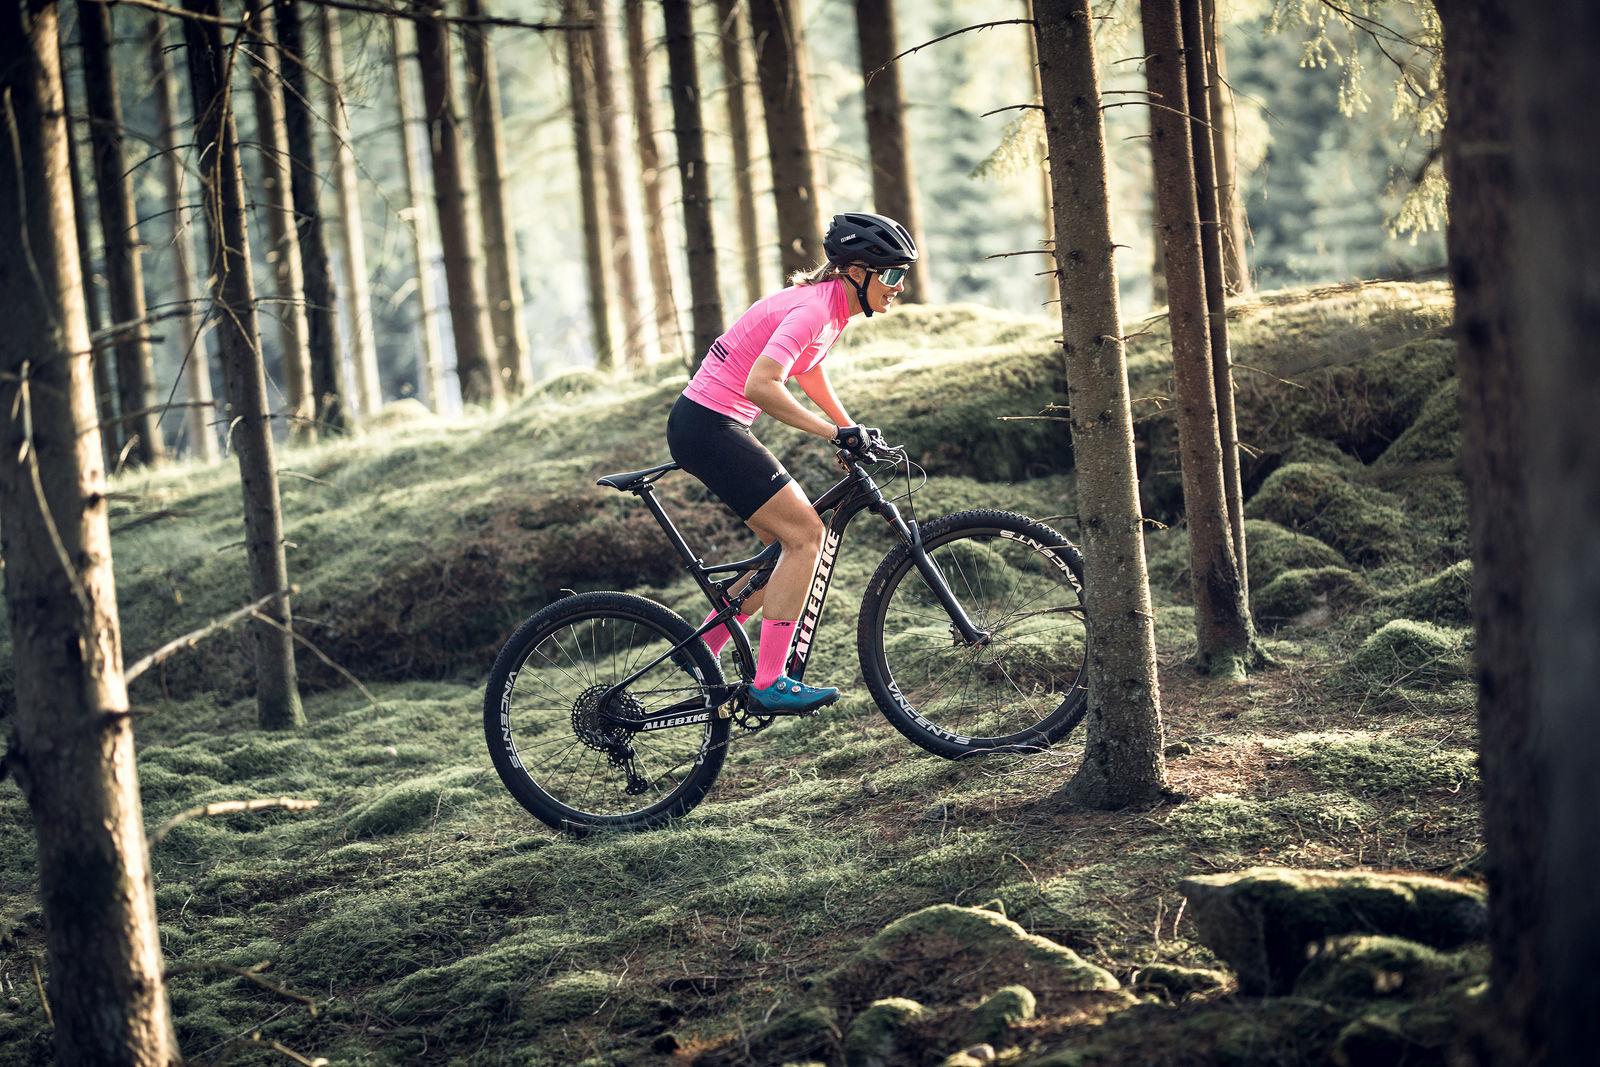 52905-13-fusion-56903-10-omega-helmet-bliz-sunglasses-cycling-mtb-matt-black-sportsglasses-action2-medium.jpg